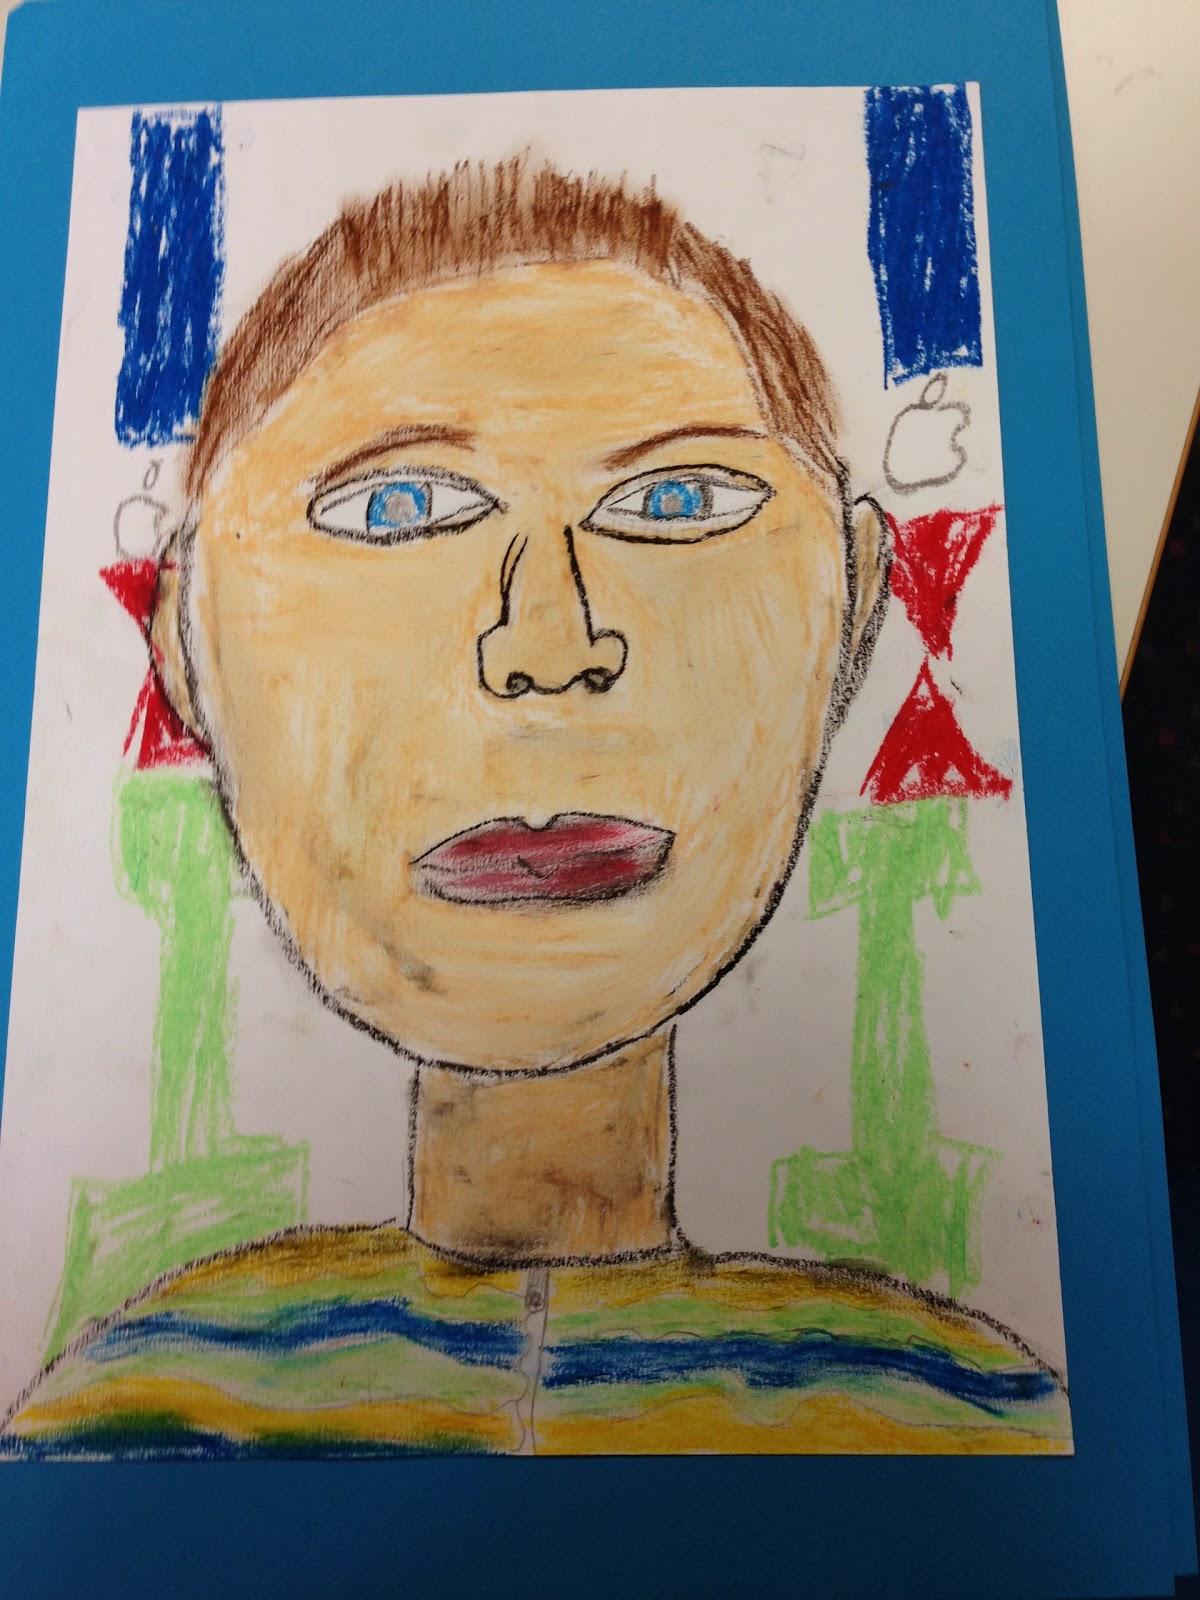 Grundschule 2.0: Selbstportru00e4ts zeichnen in der Grundschule